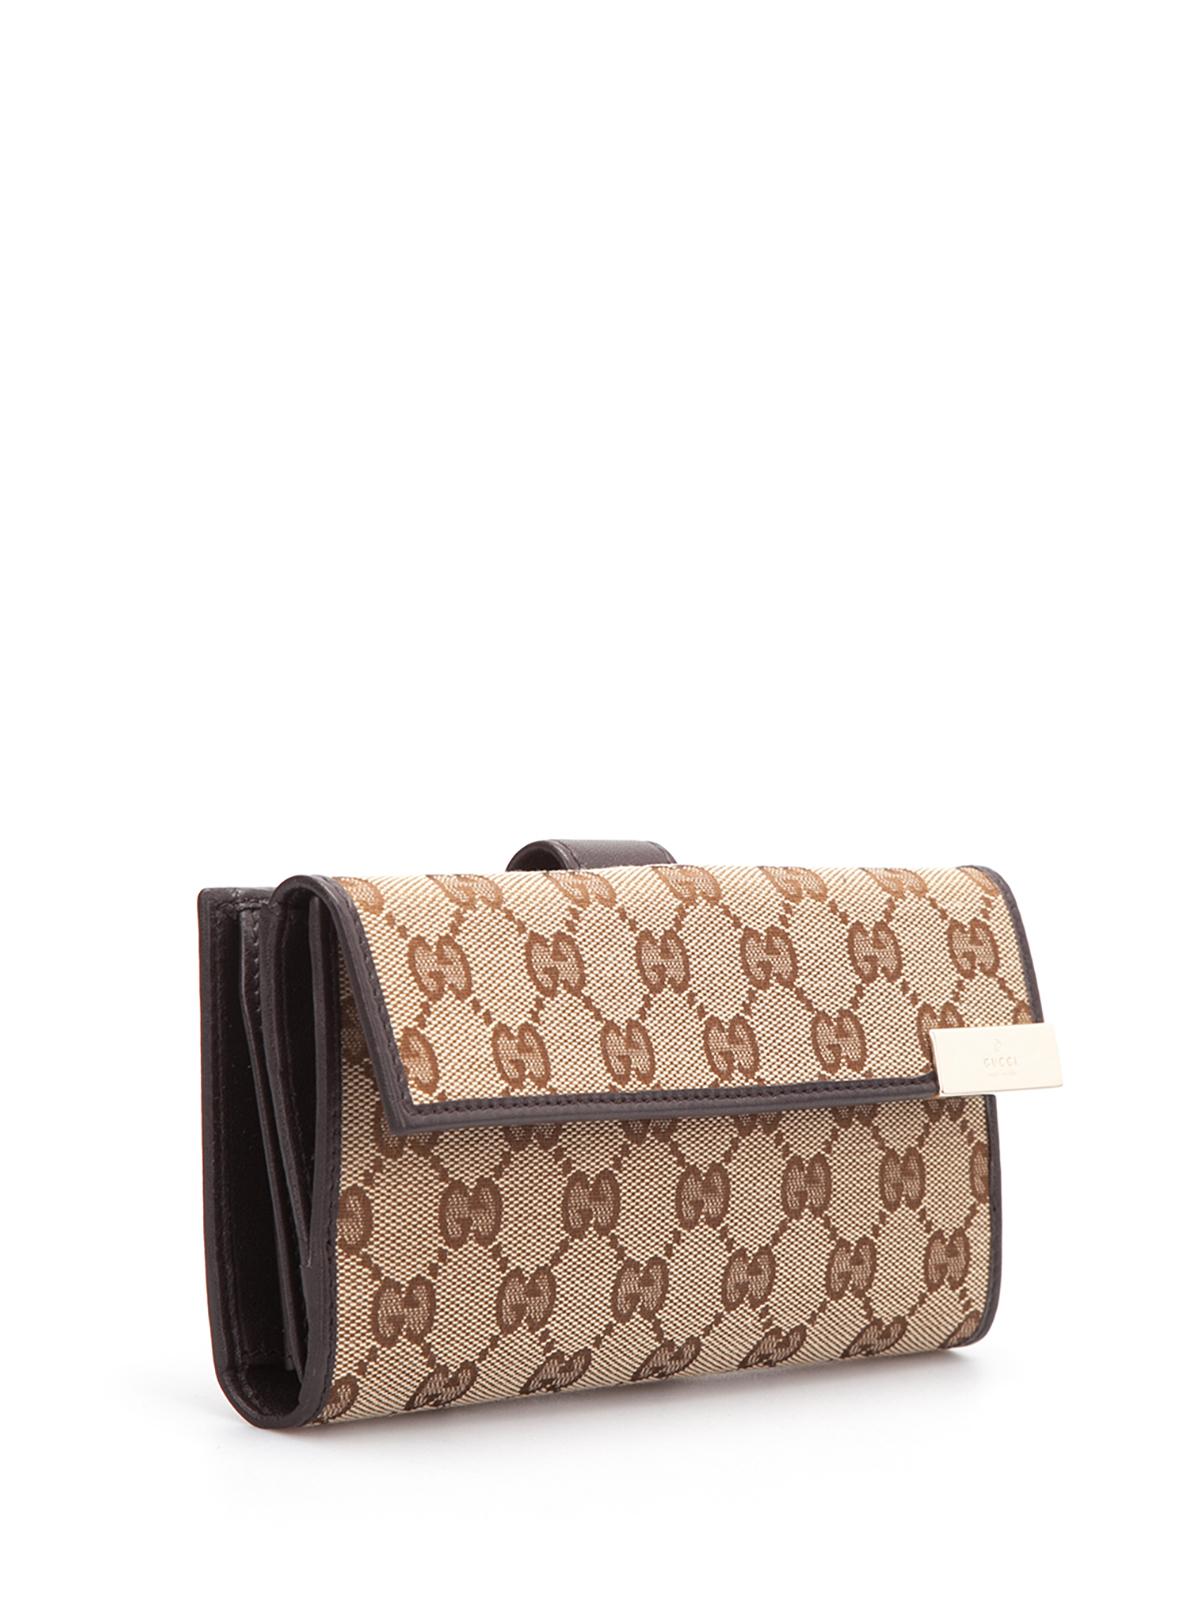 b372282da45 Gucci - GG canvas continental wallet - wallets   purses - 257012 ...